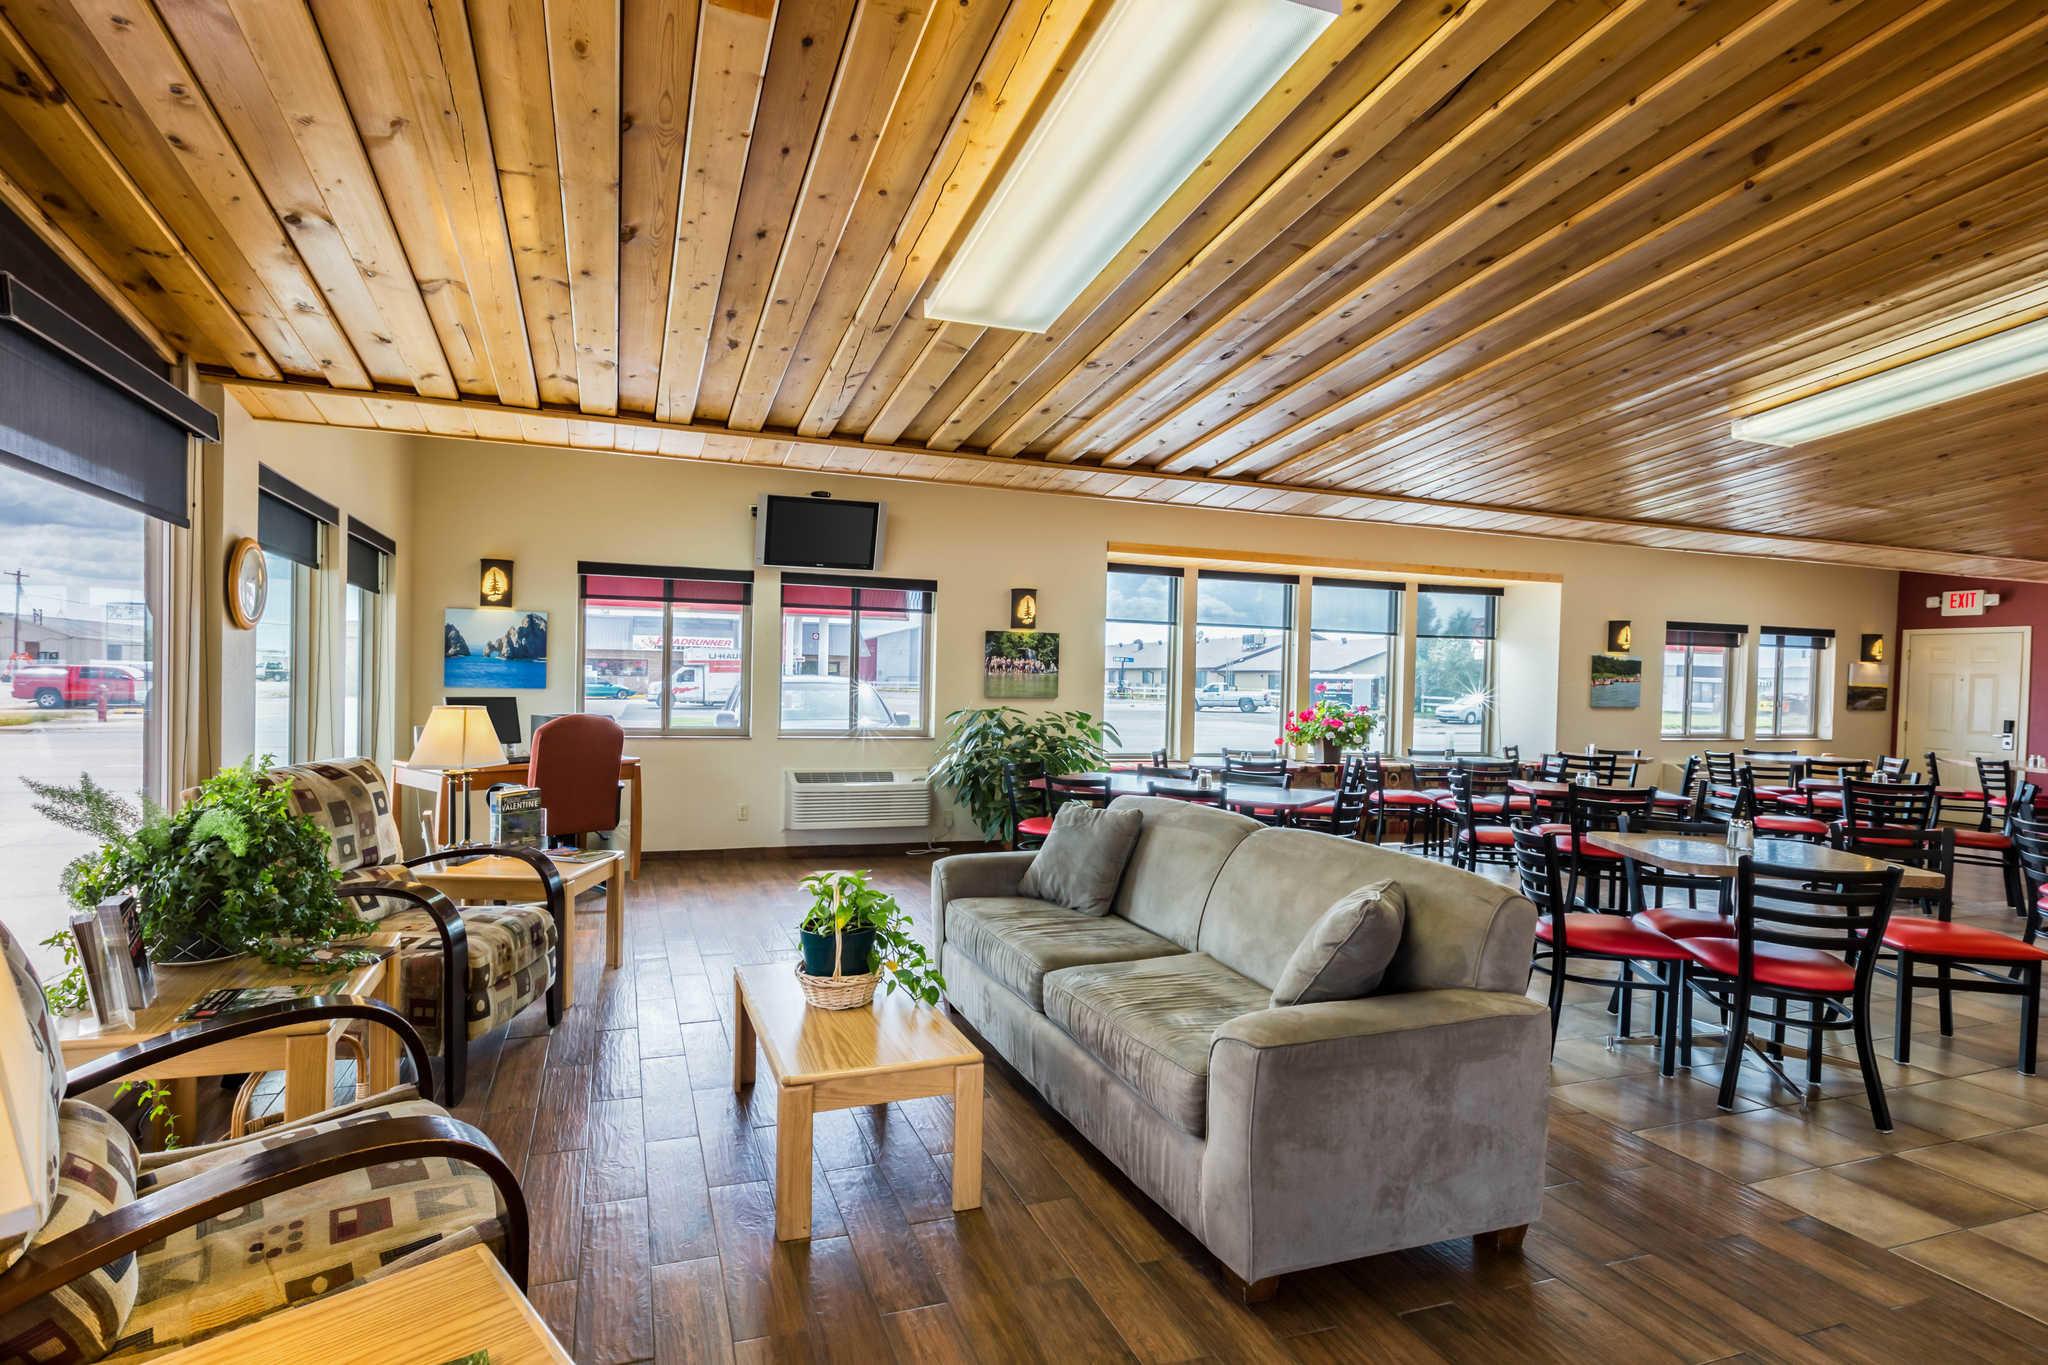 Econo Lodge Inn Amp Suites Coupons Valentine NE Near Me